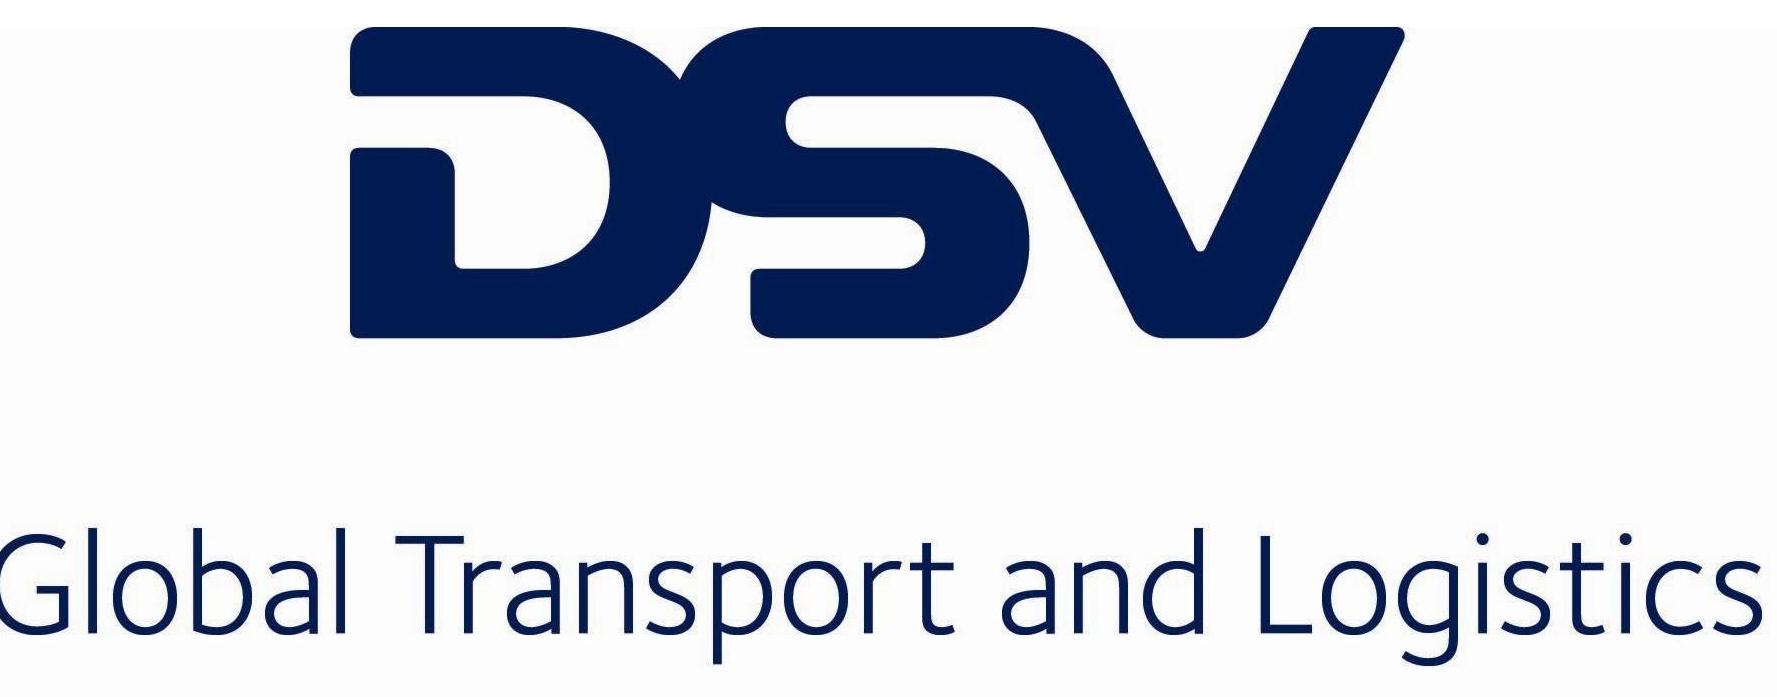 DSV-EU-Japan-EPA-Forum-trade-investment-M-and-A-Europe